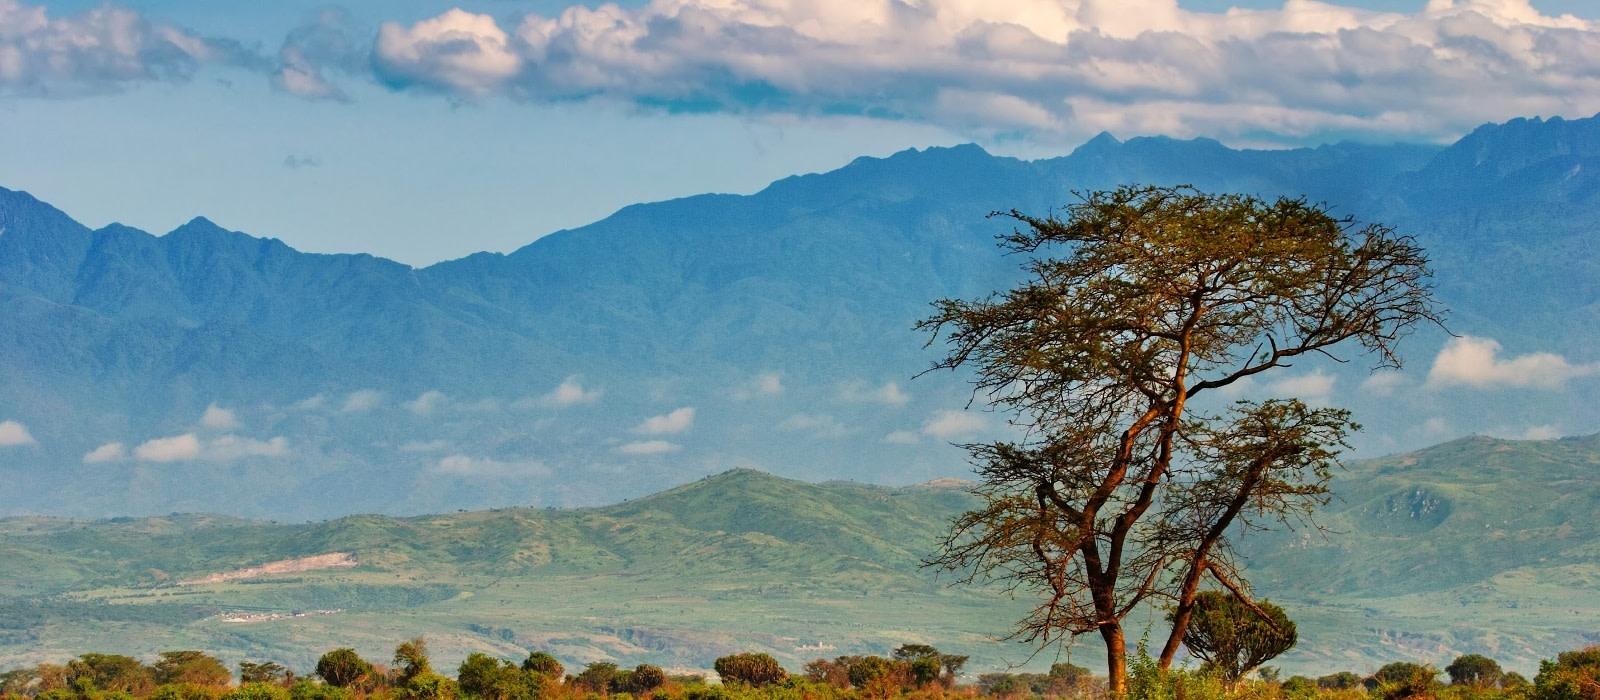 Reiseziel Queen Elizabeth Uganda